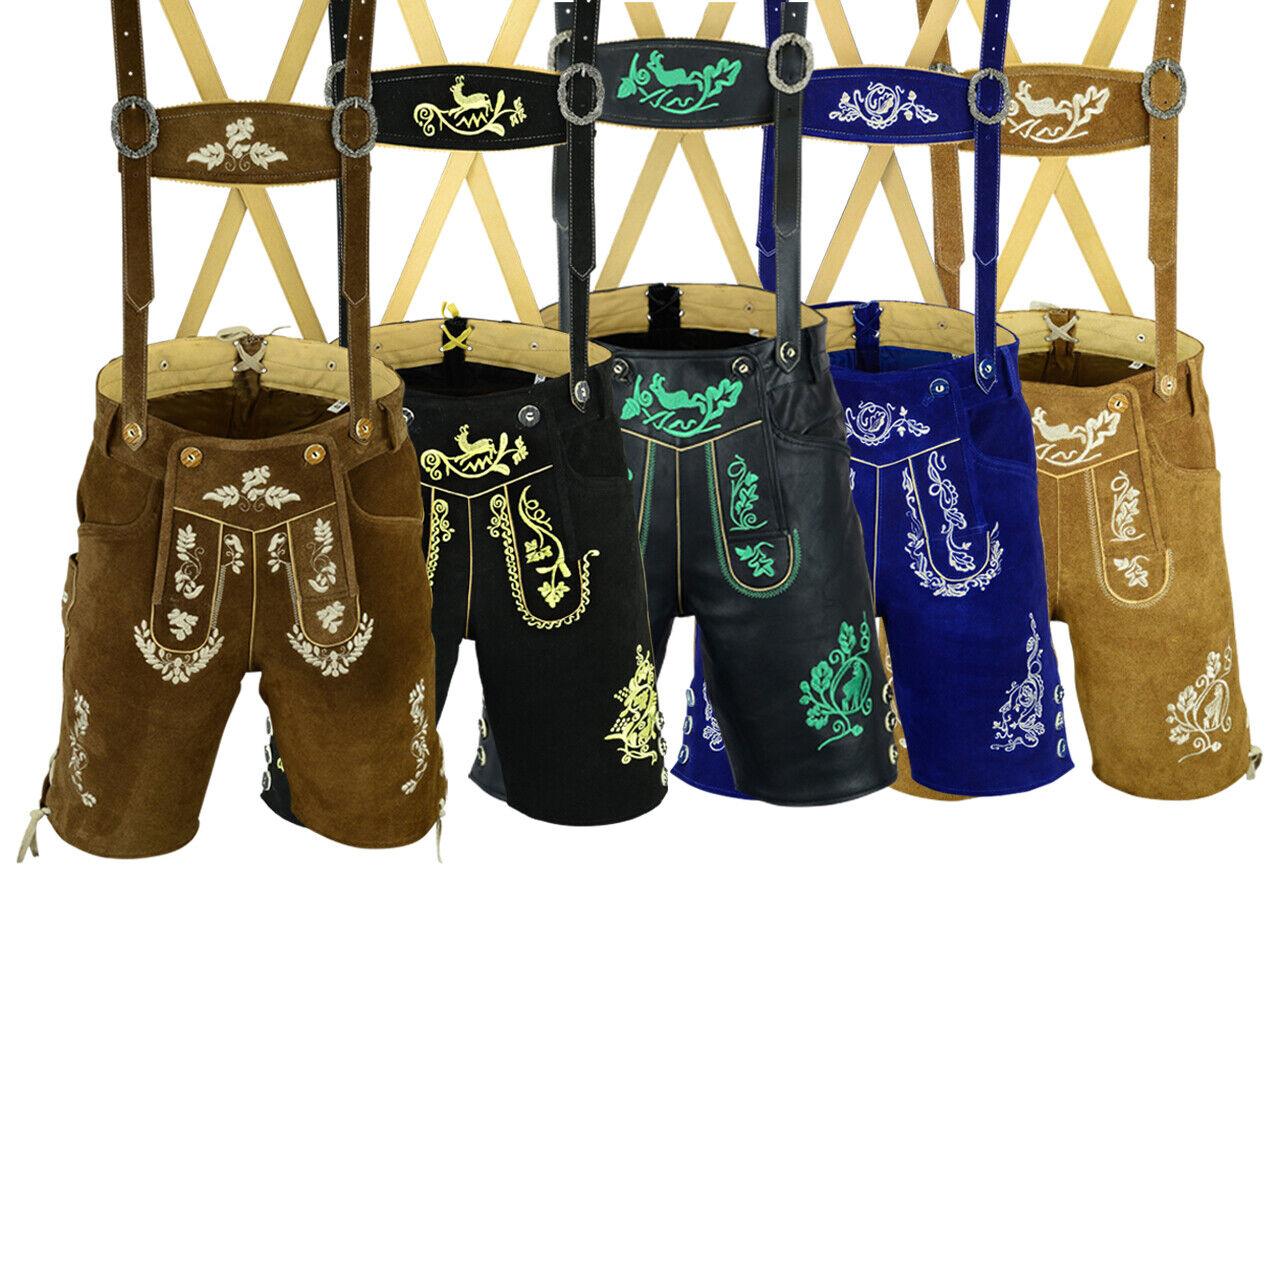 Herren Trachtenlederhose Kurz Inkl. Hosen Träger in 4 Farbe 46 bis 60 LEFAM